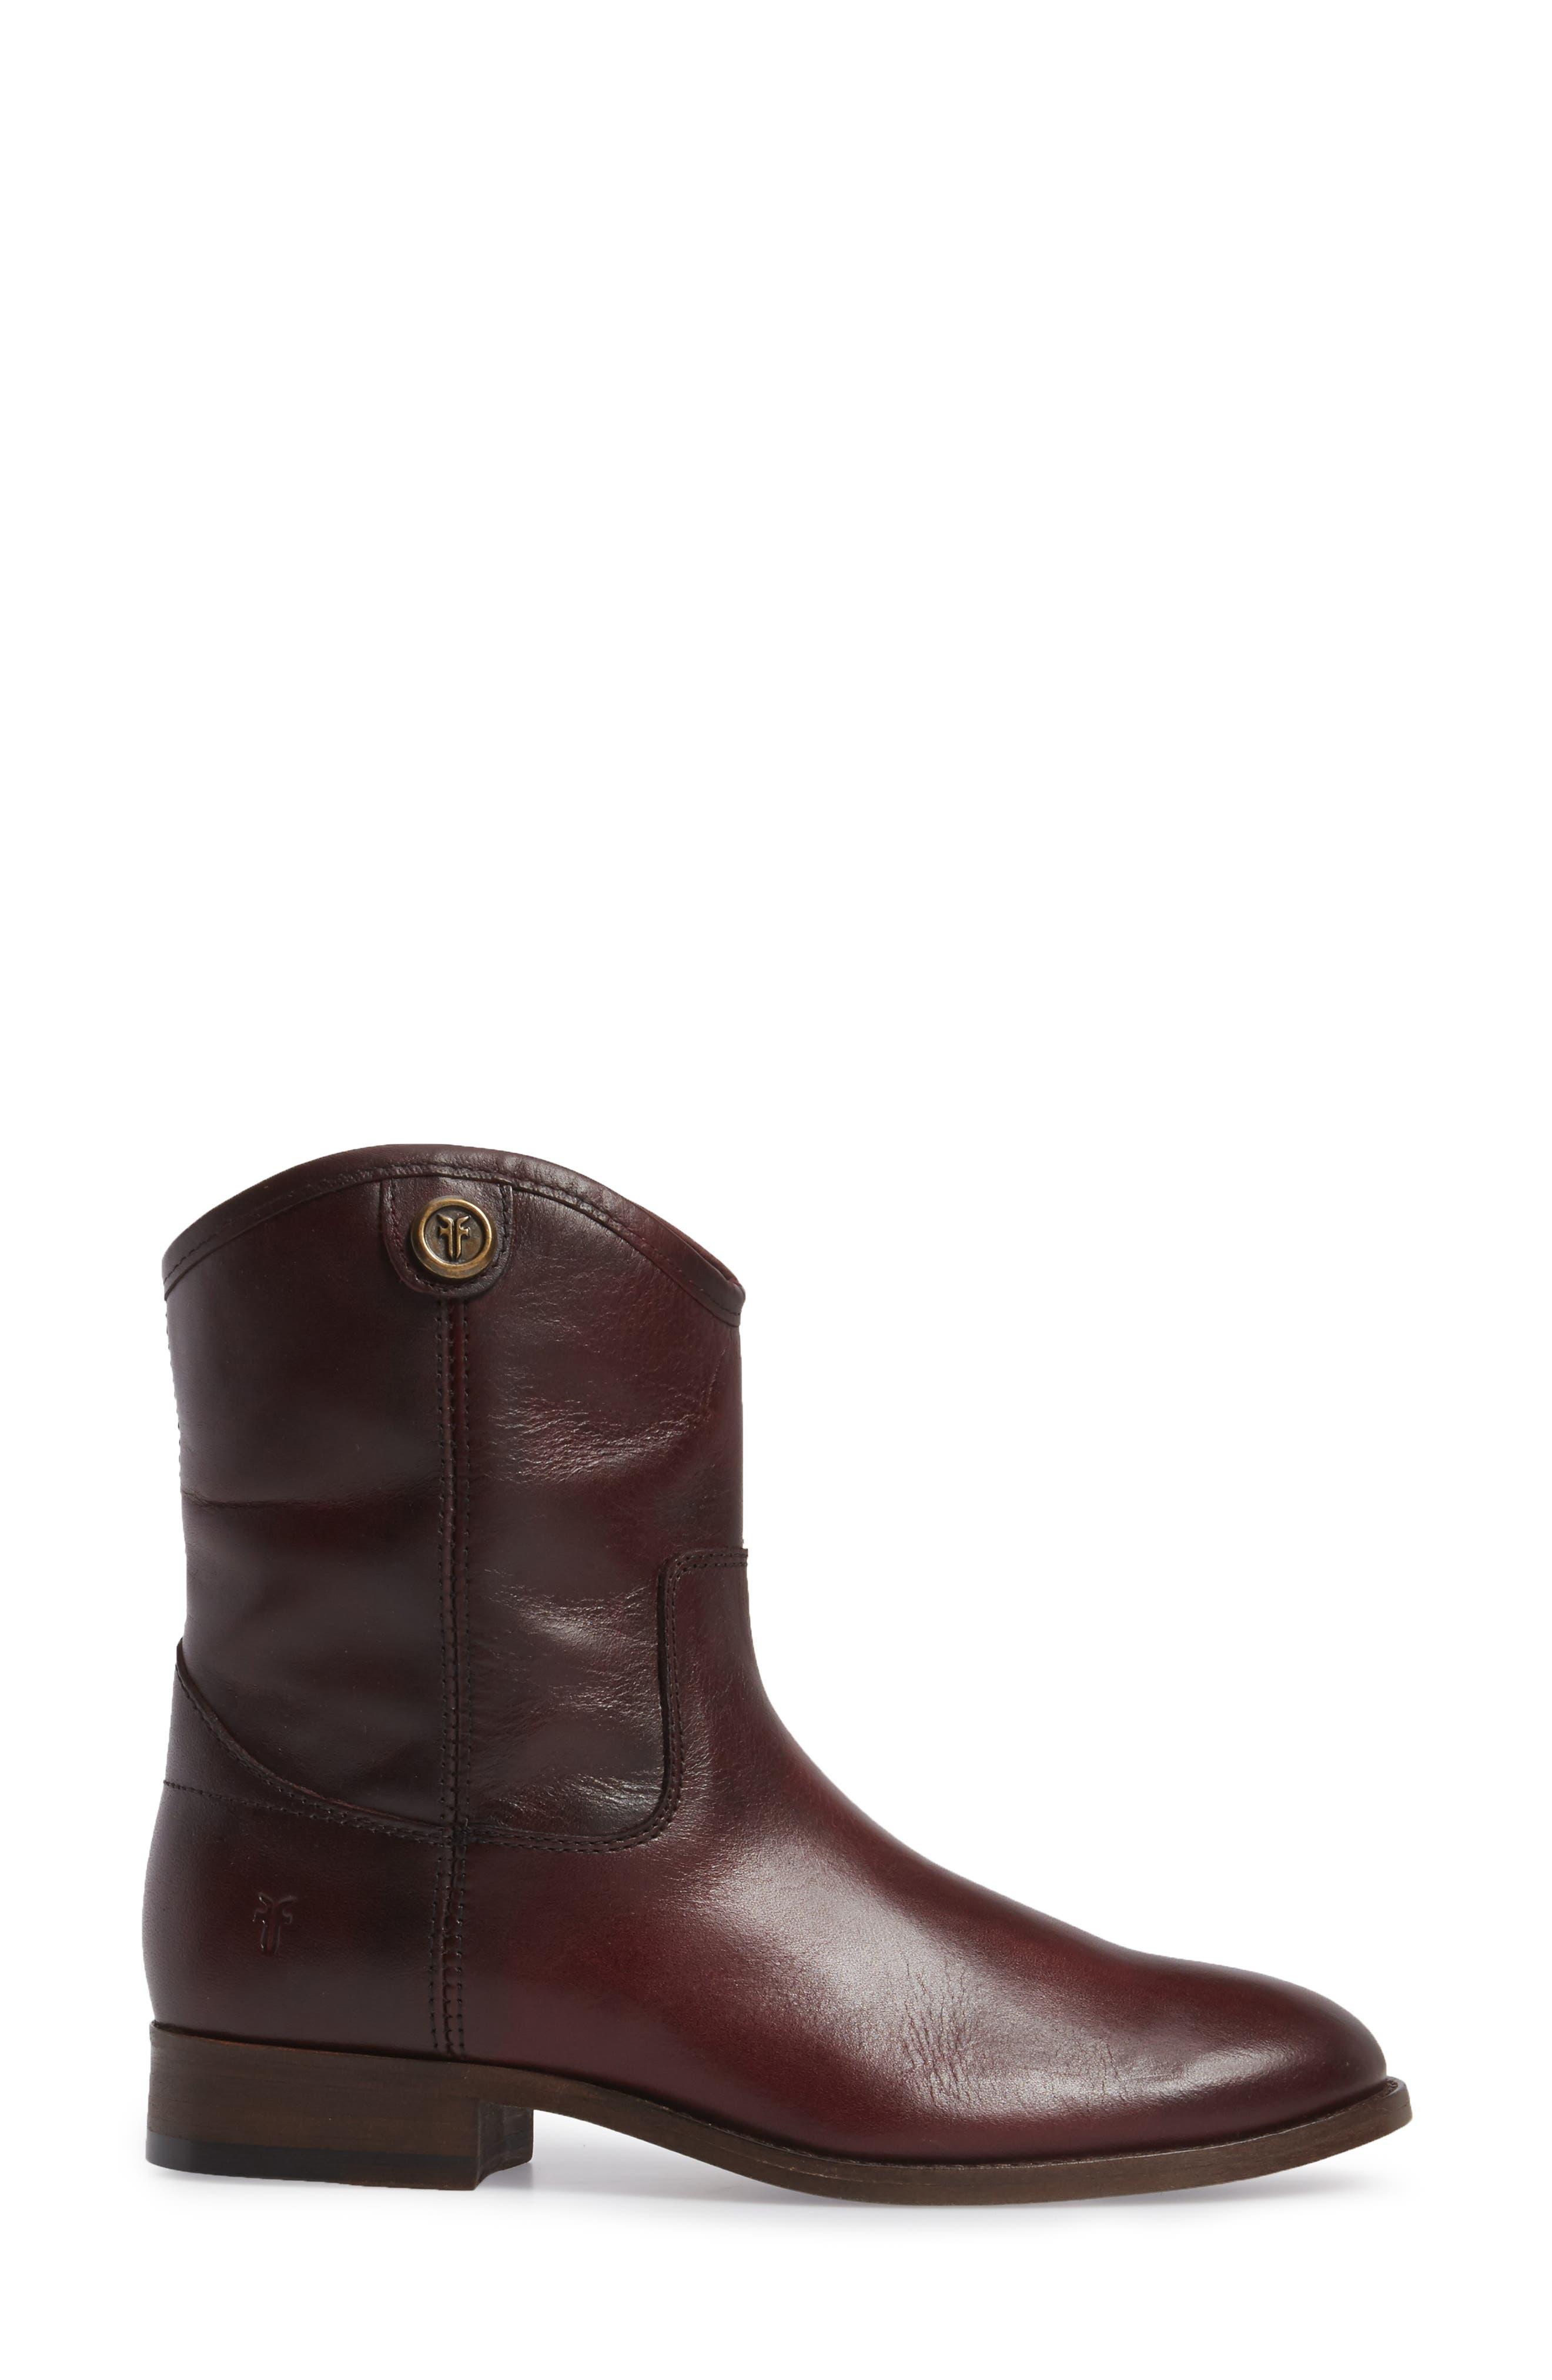 Melissa Short 2 Boot,                             Alternate thumbnail 3, color,                             Wine Leather